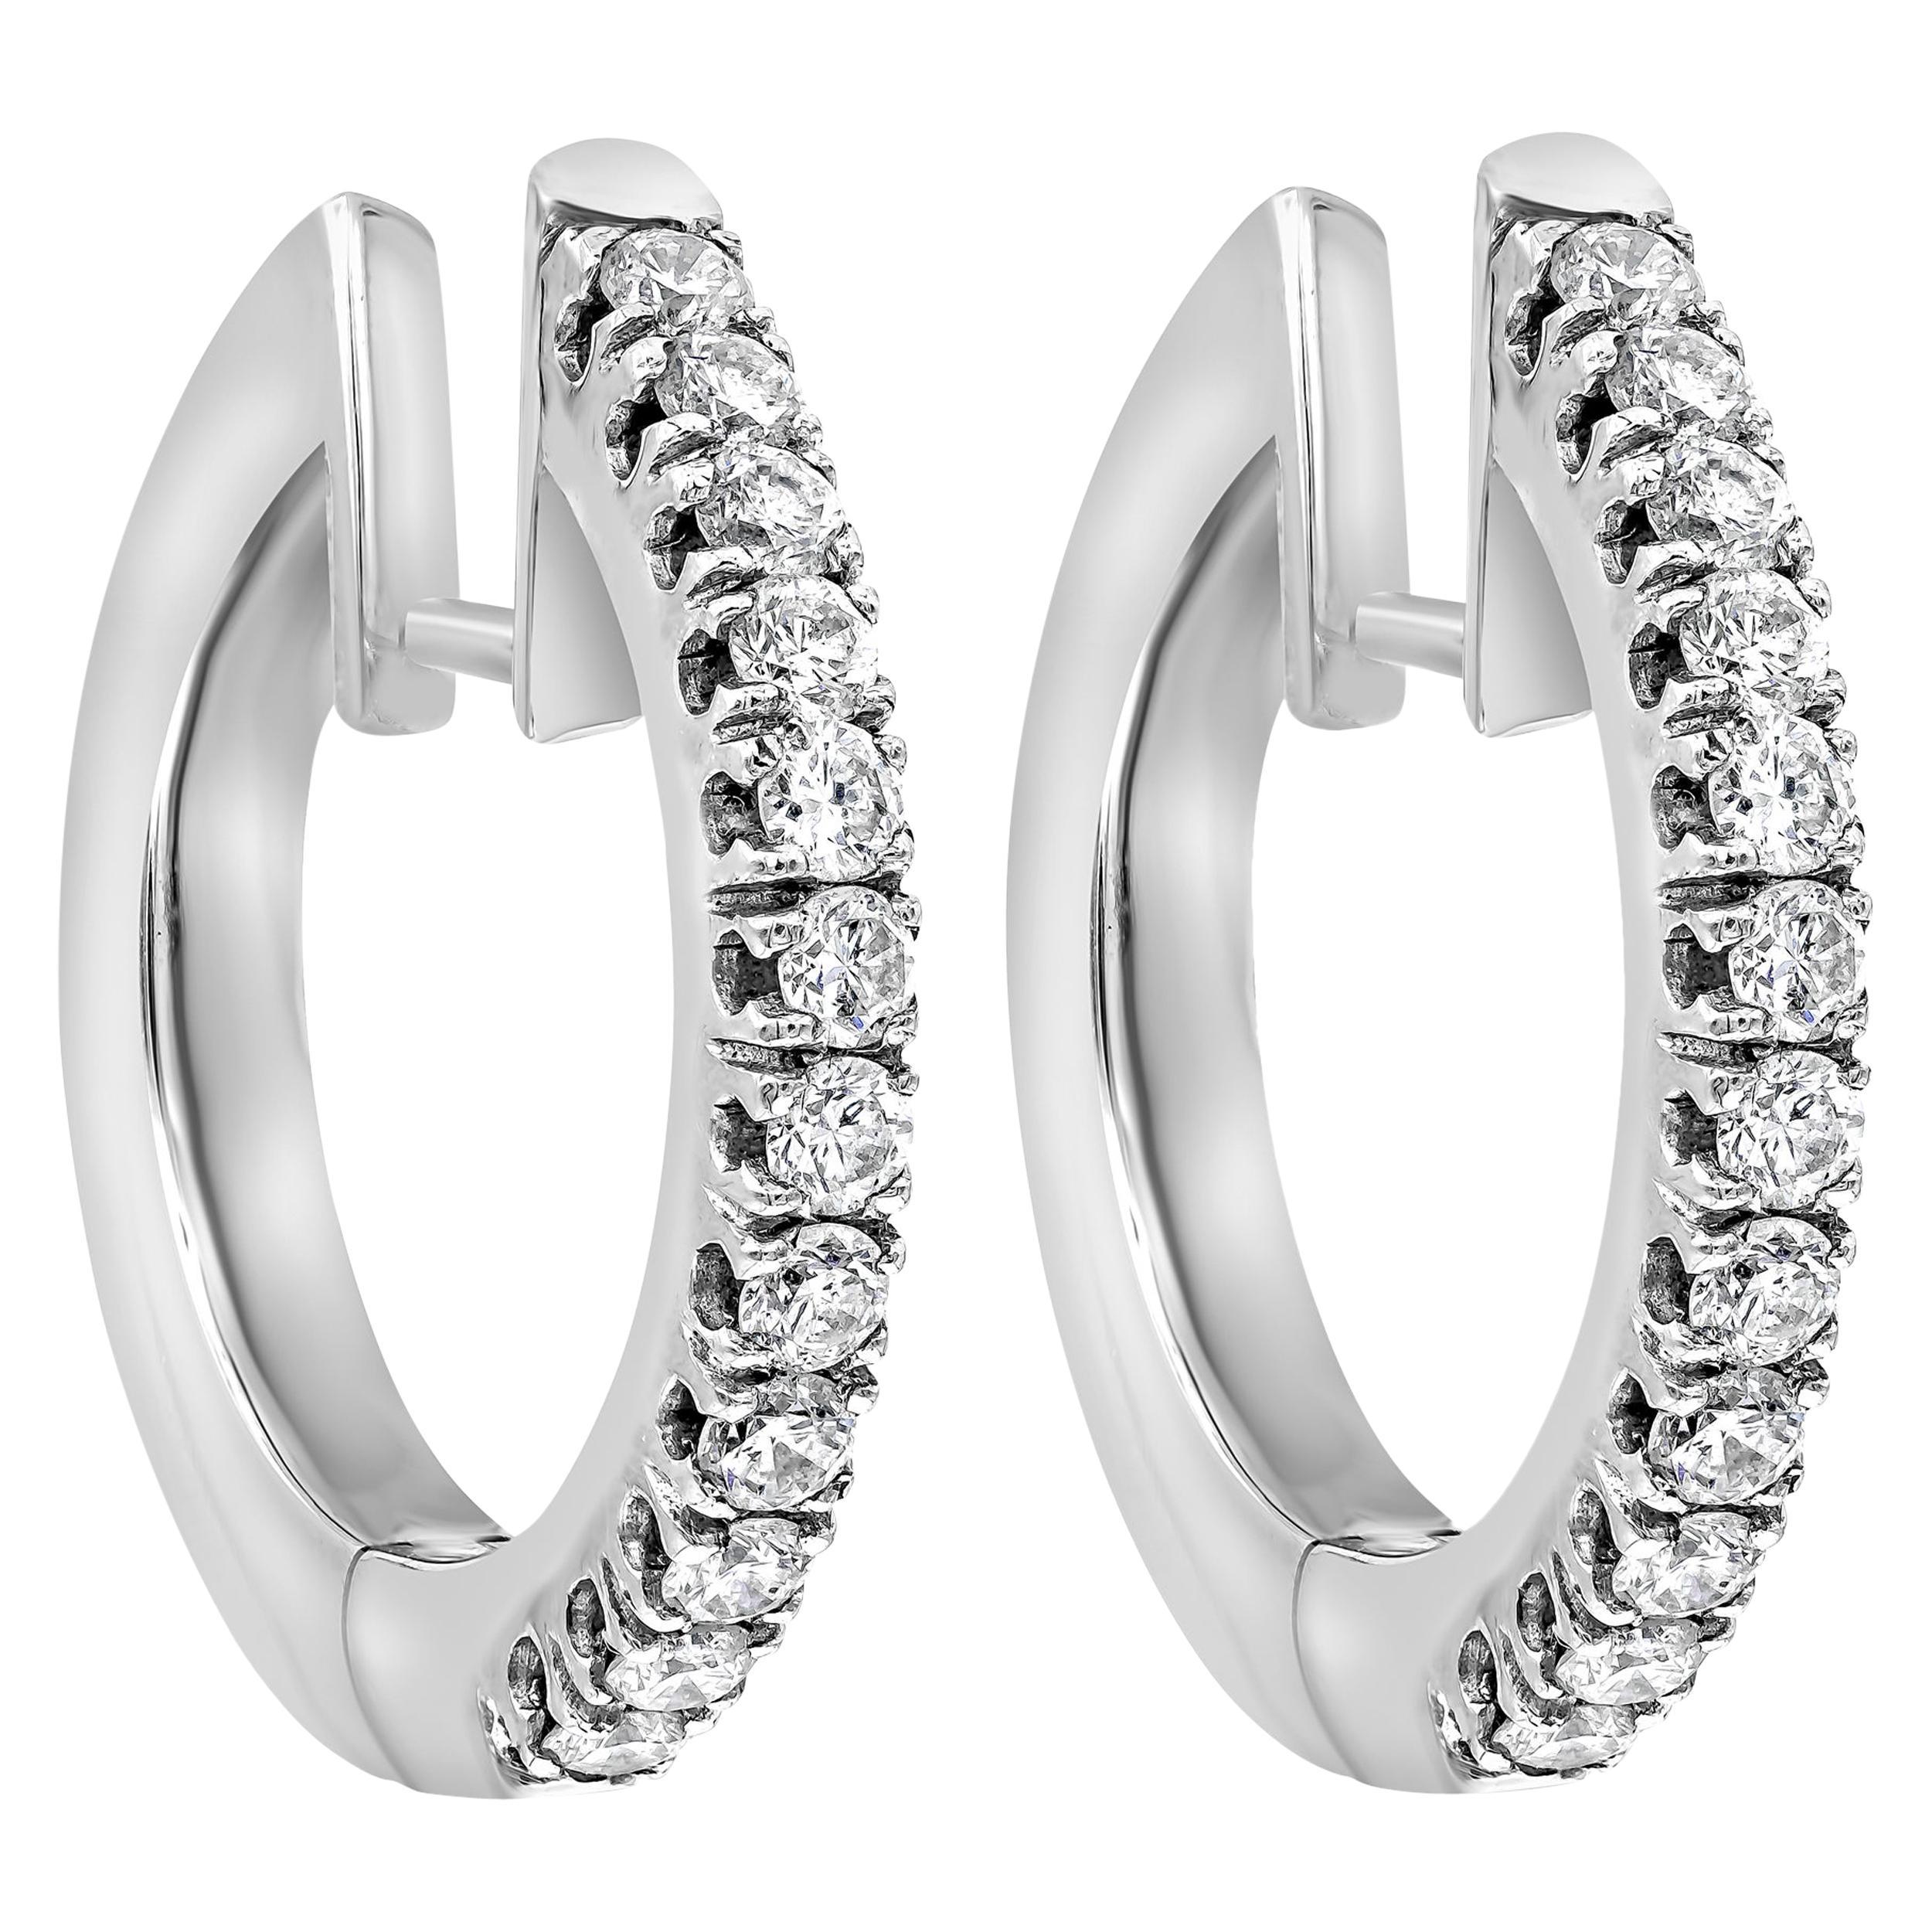 Roman Malakov, 0.64 Carat Round Diamond Hoop Earrings in 18 Karat White Gold